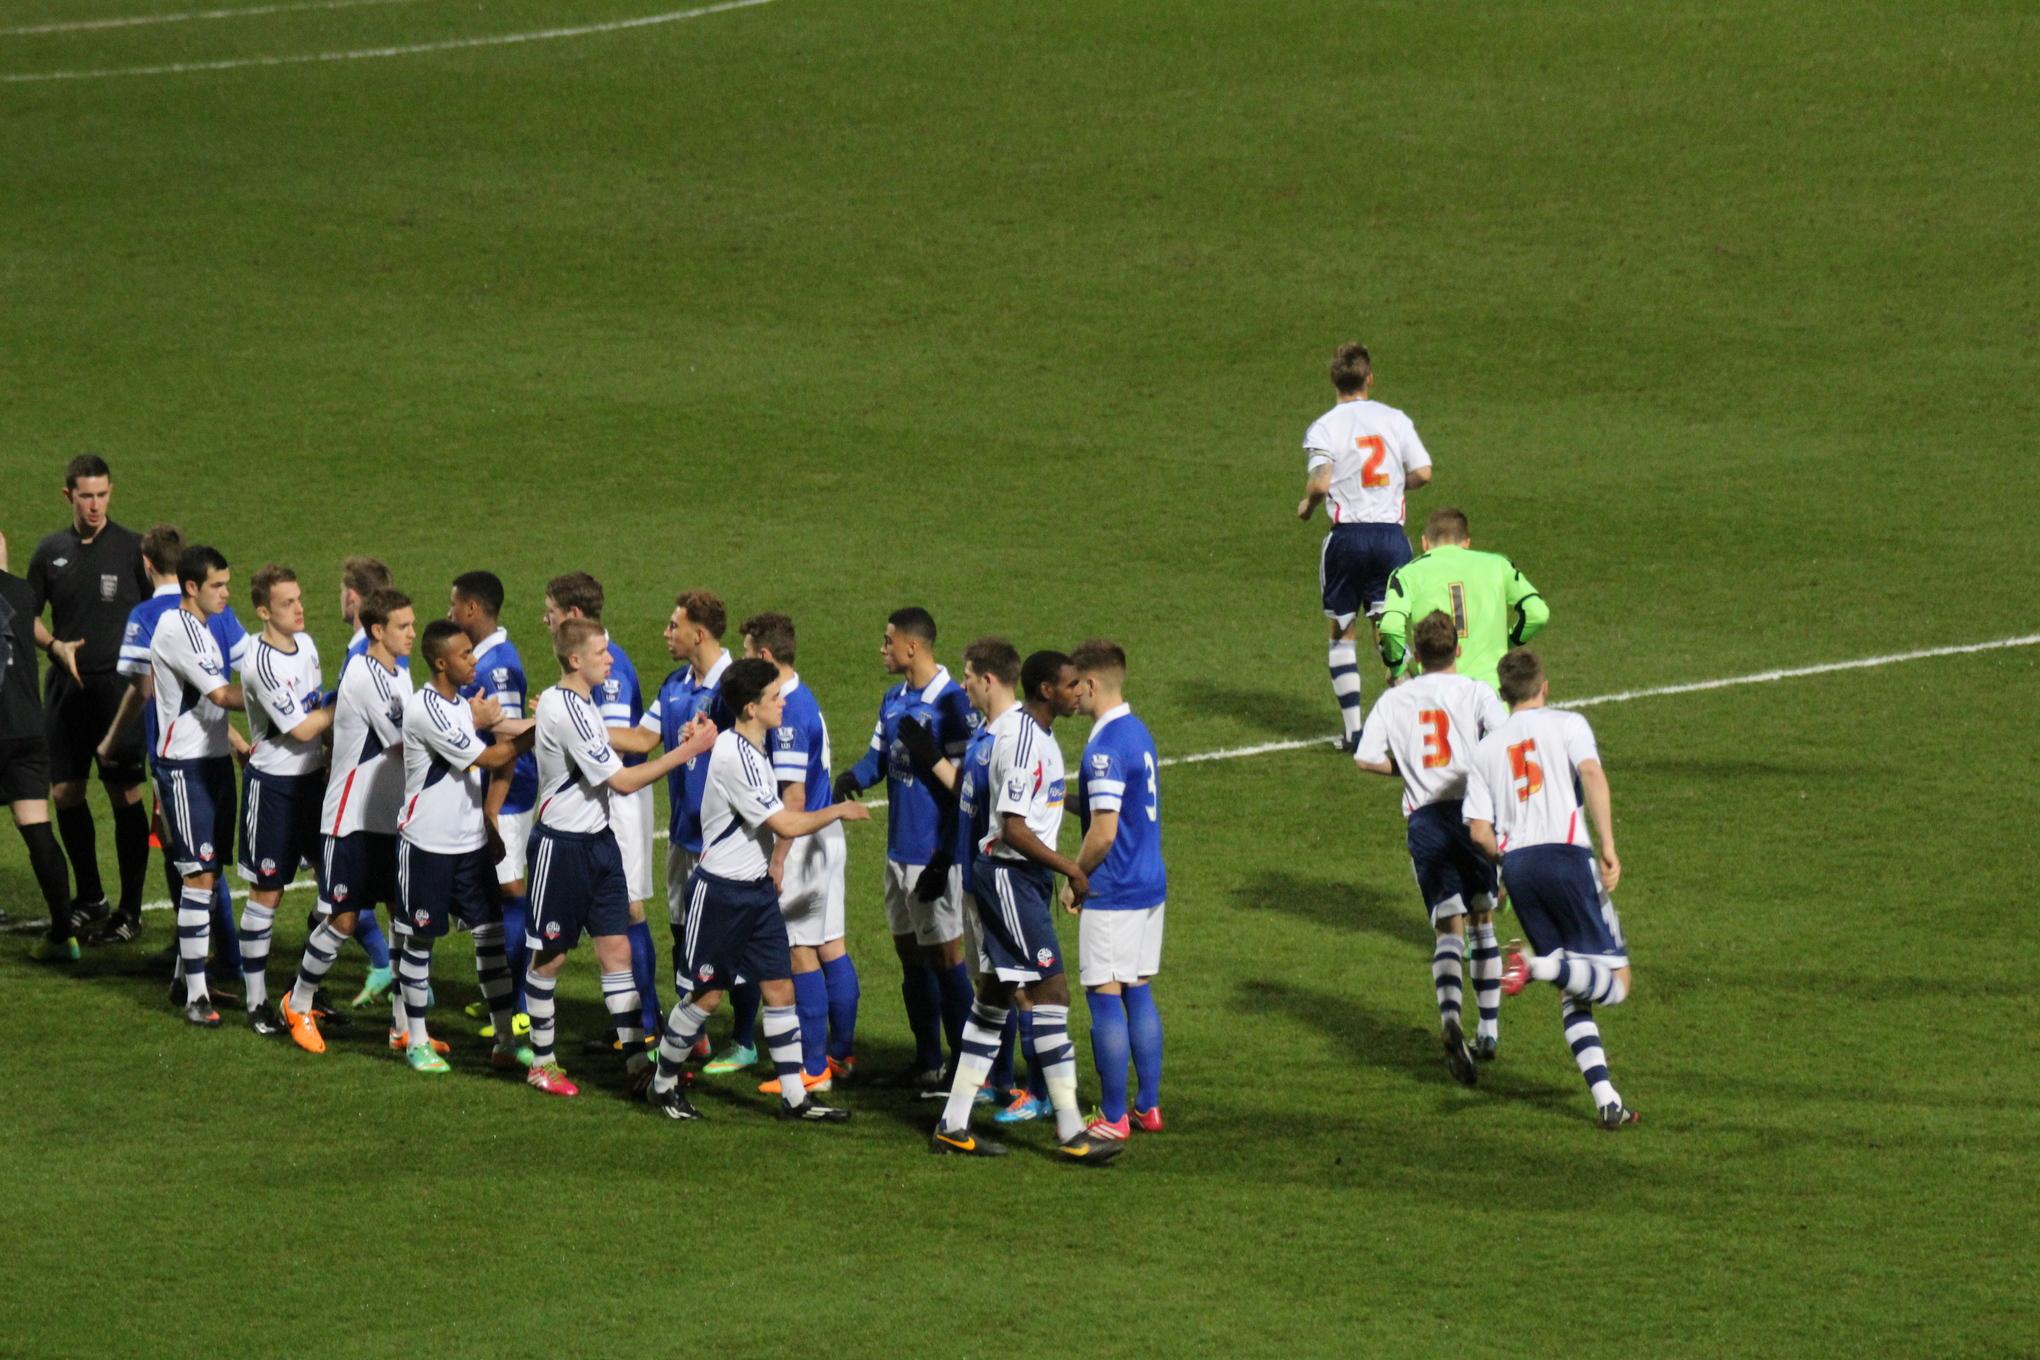 Bolton's u21s hosted Everton's u21s at the Reebok Stadium on Monday.